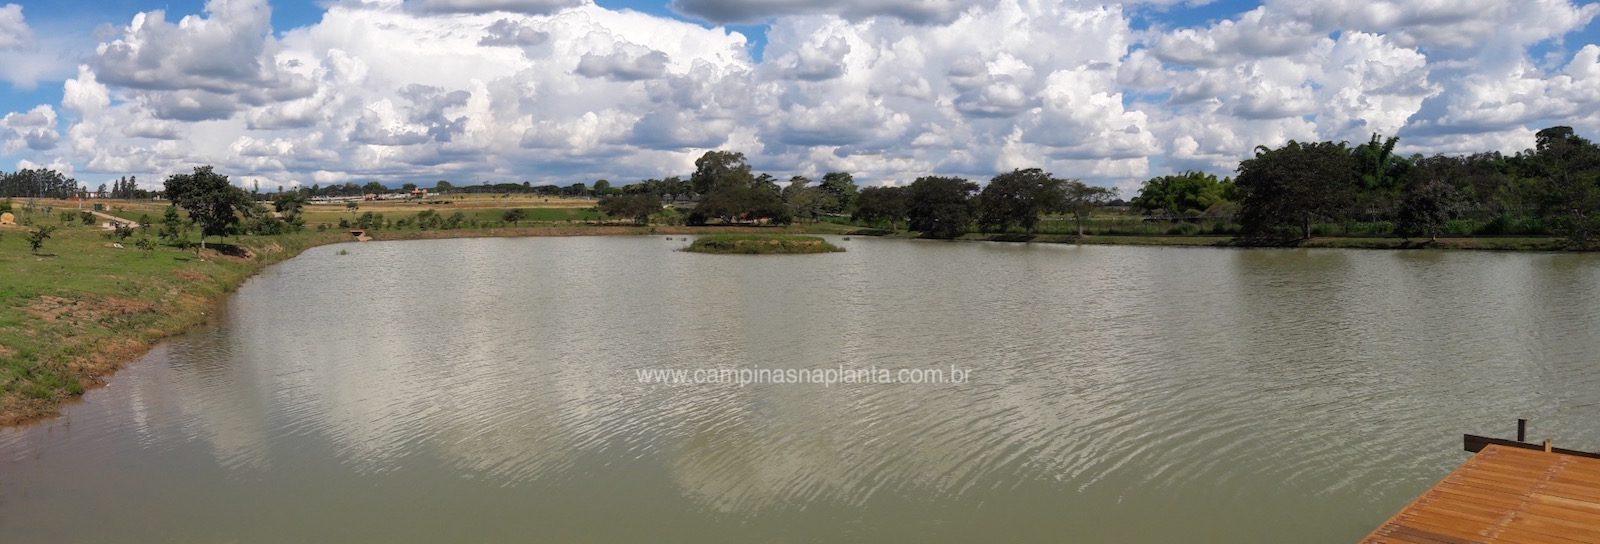 Tamboré Jaguariúna foto panorâmica do lago